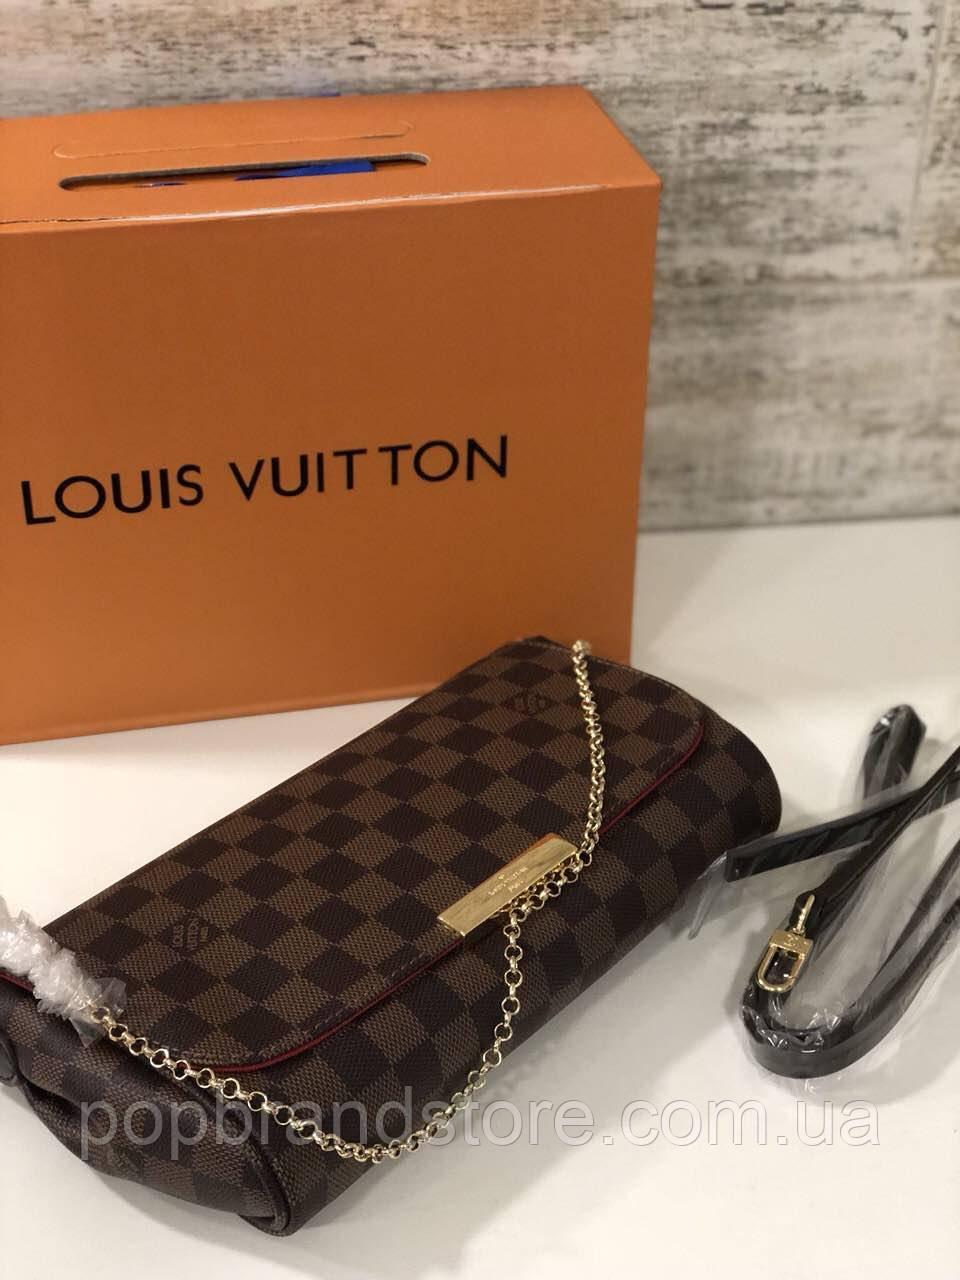 сумка Louis Vuitton украина : Louis vuitton monogram canvas